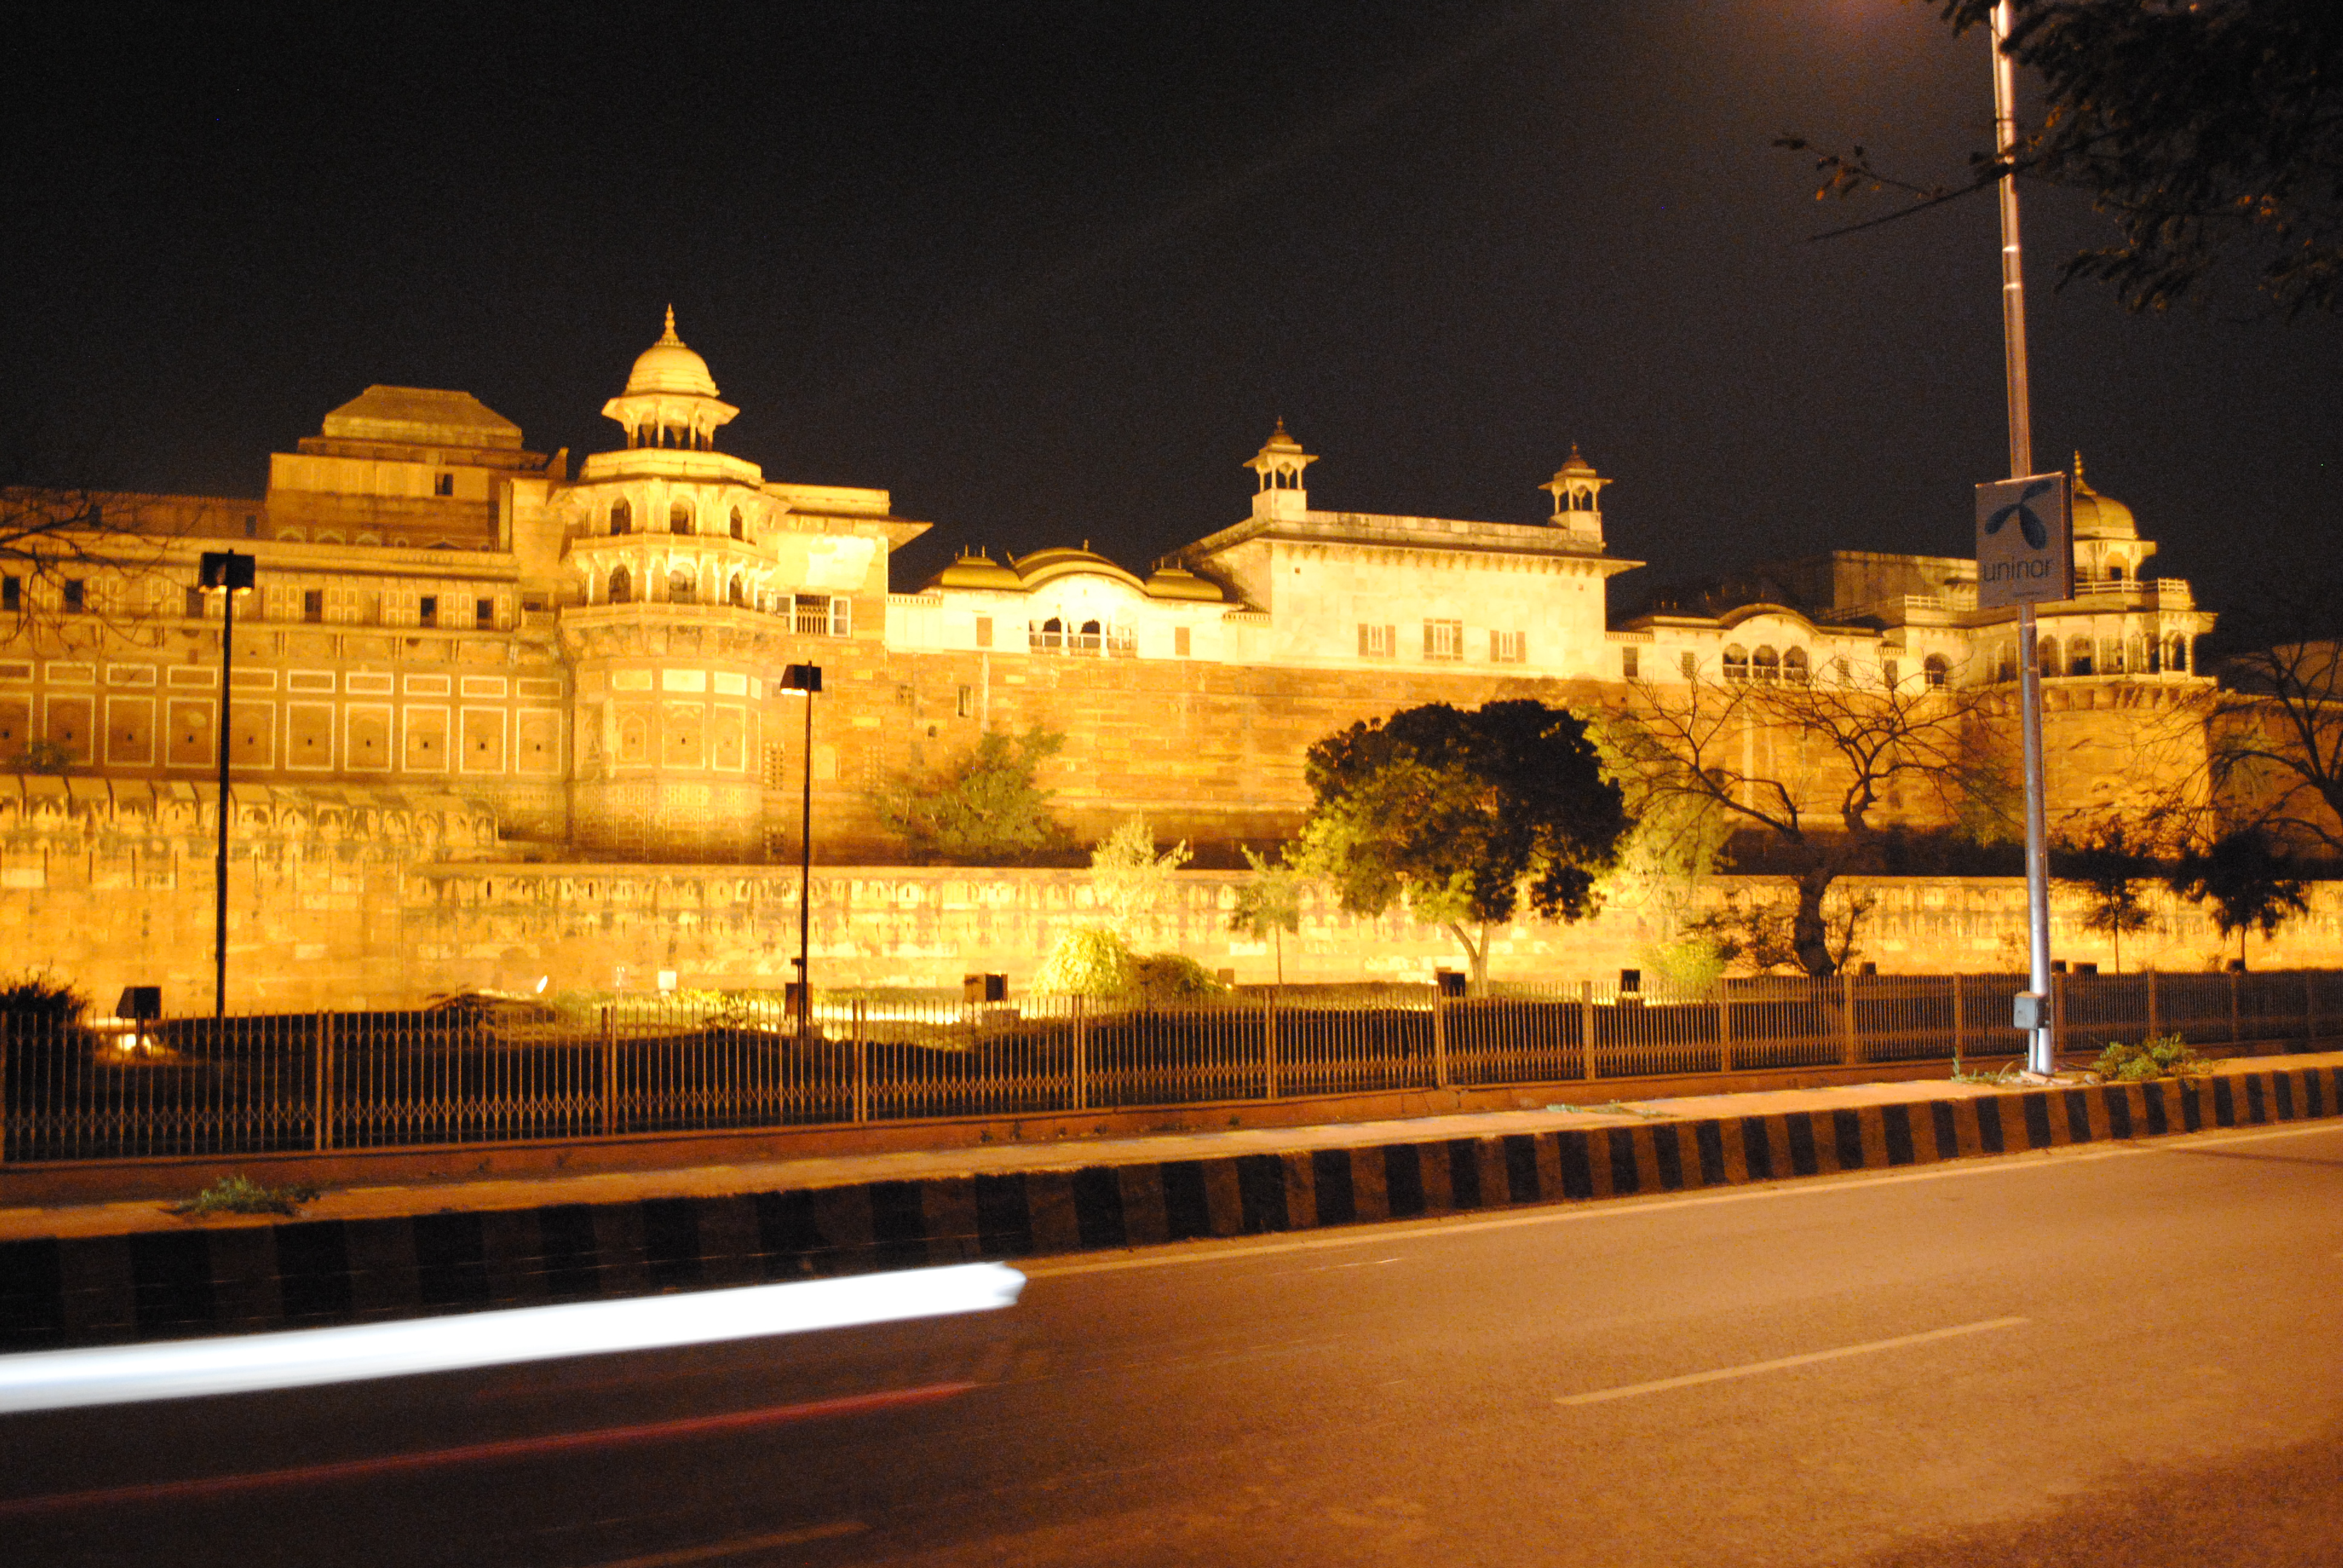 Night light wikipedia - File Agra Fort Night Light Jpg